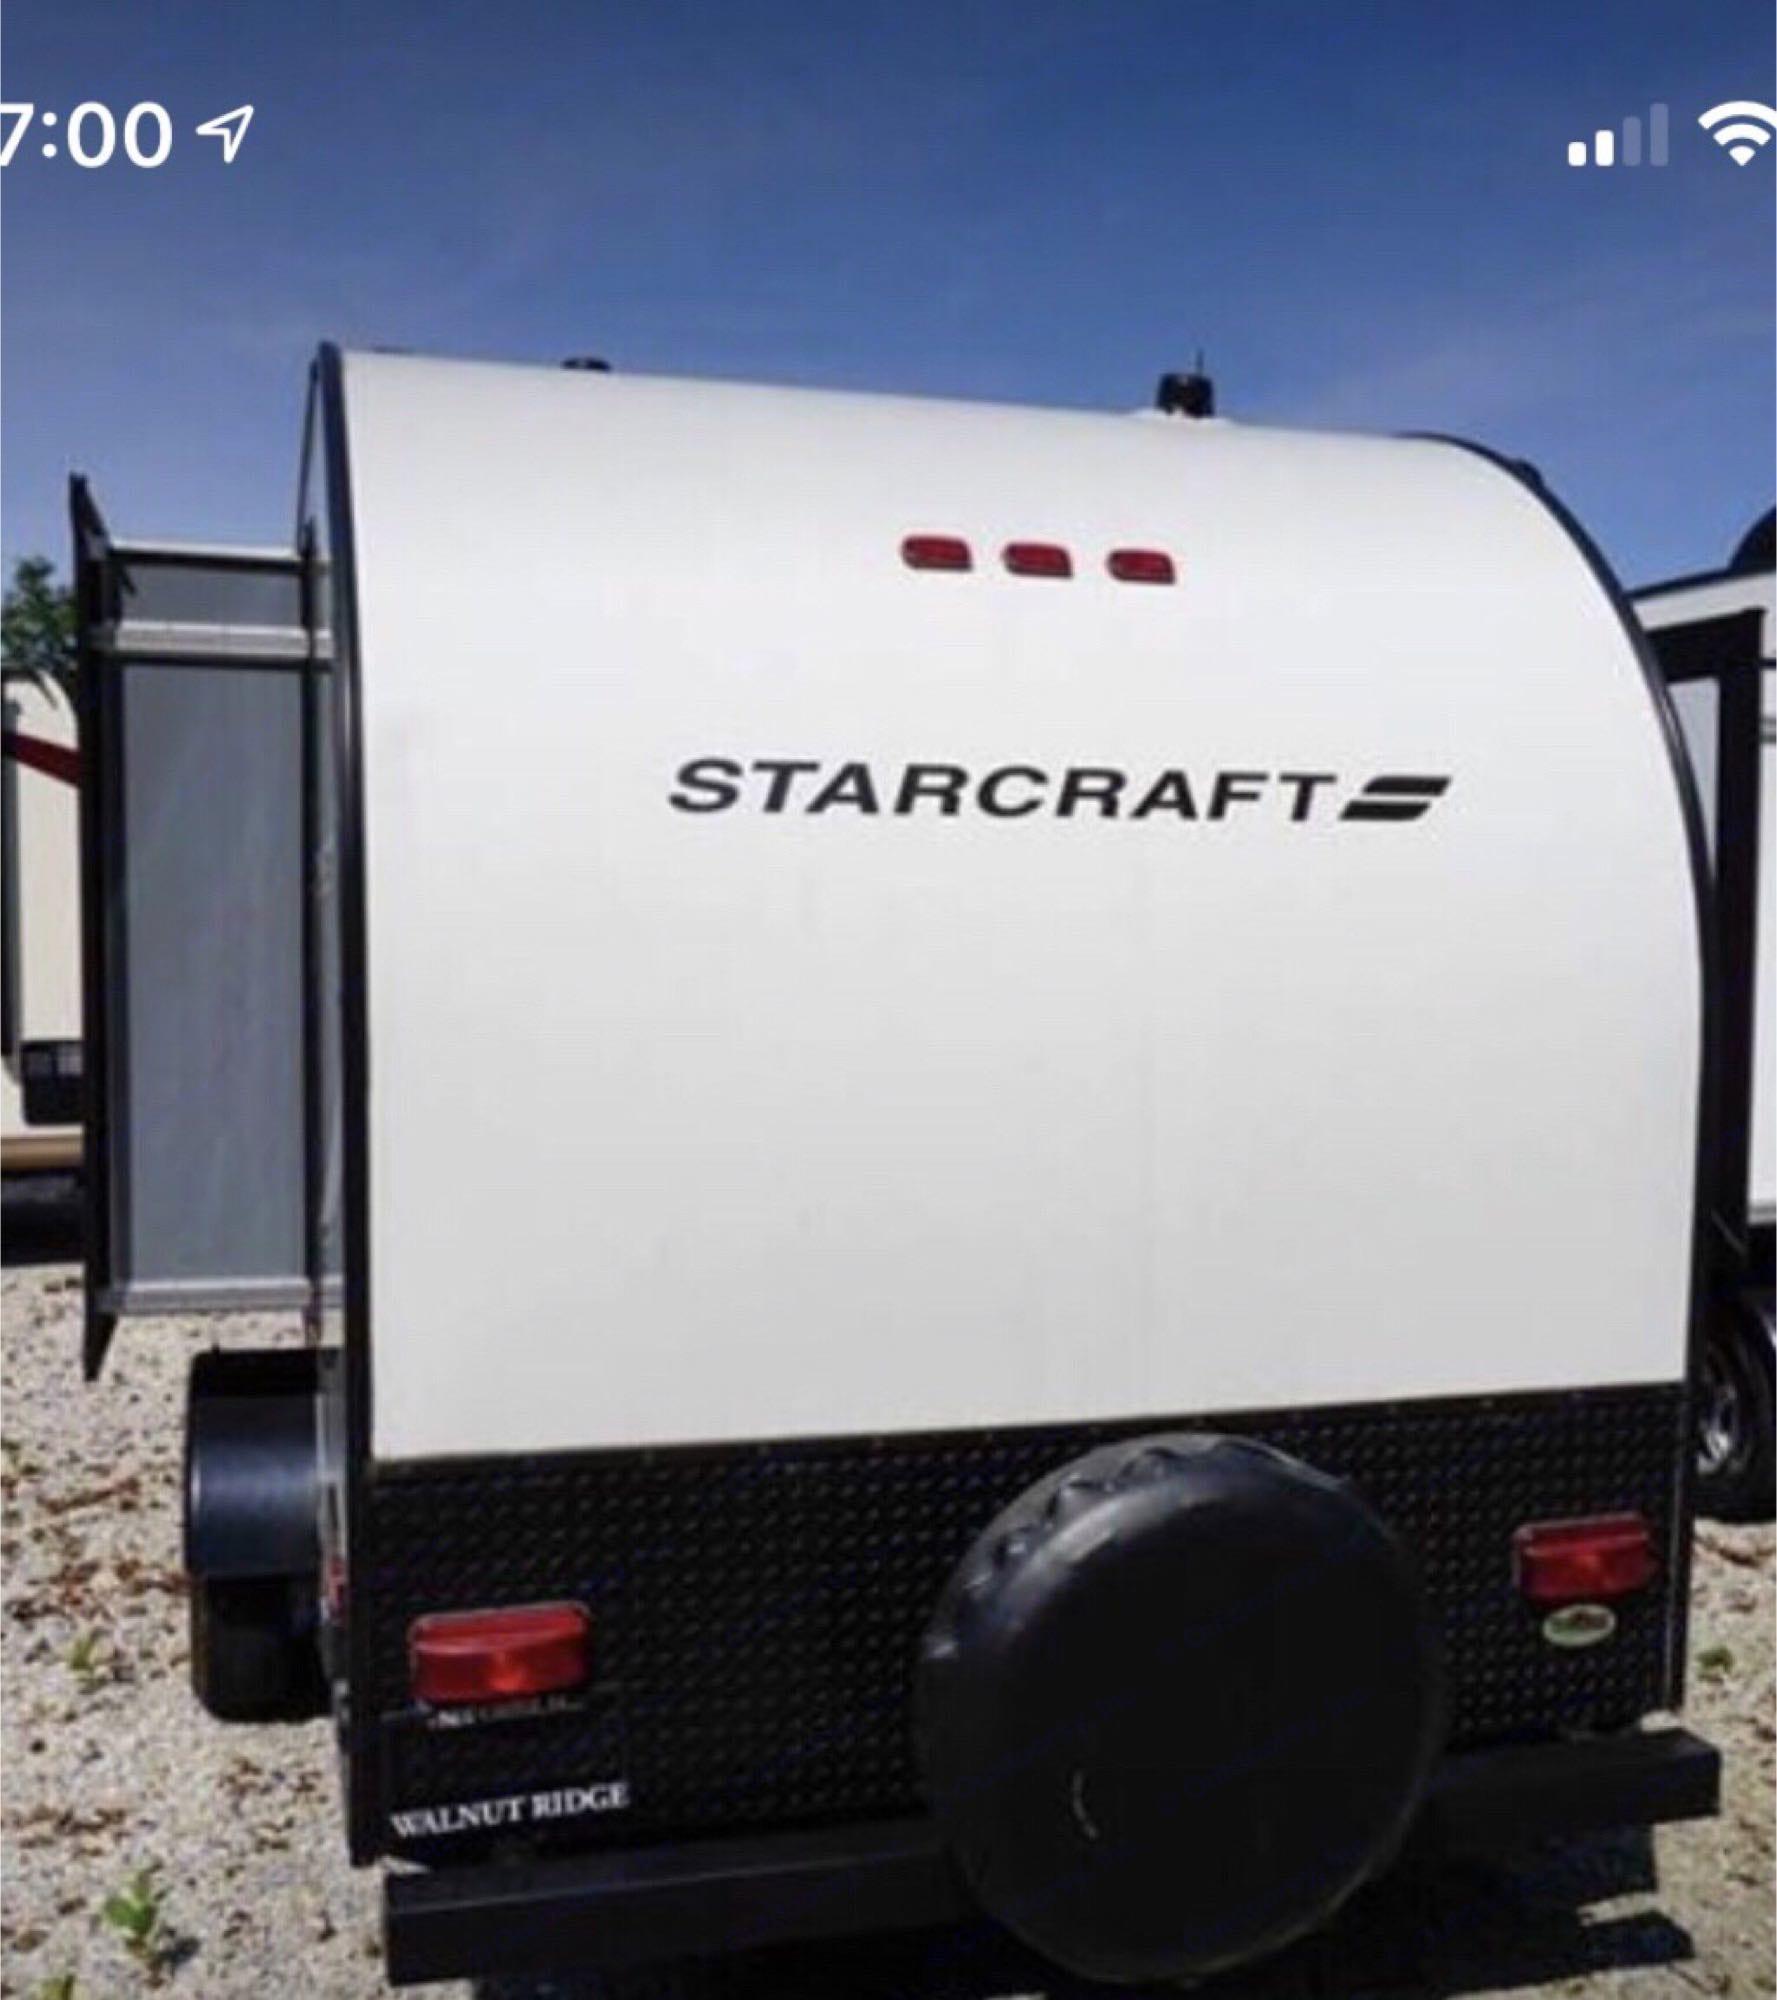 Starcraft Comet 2018